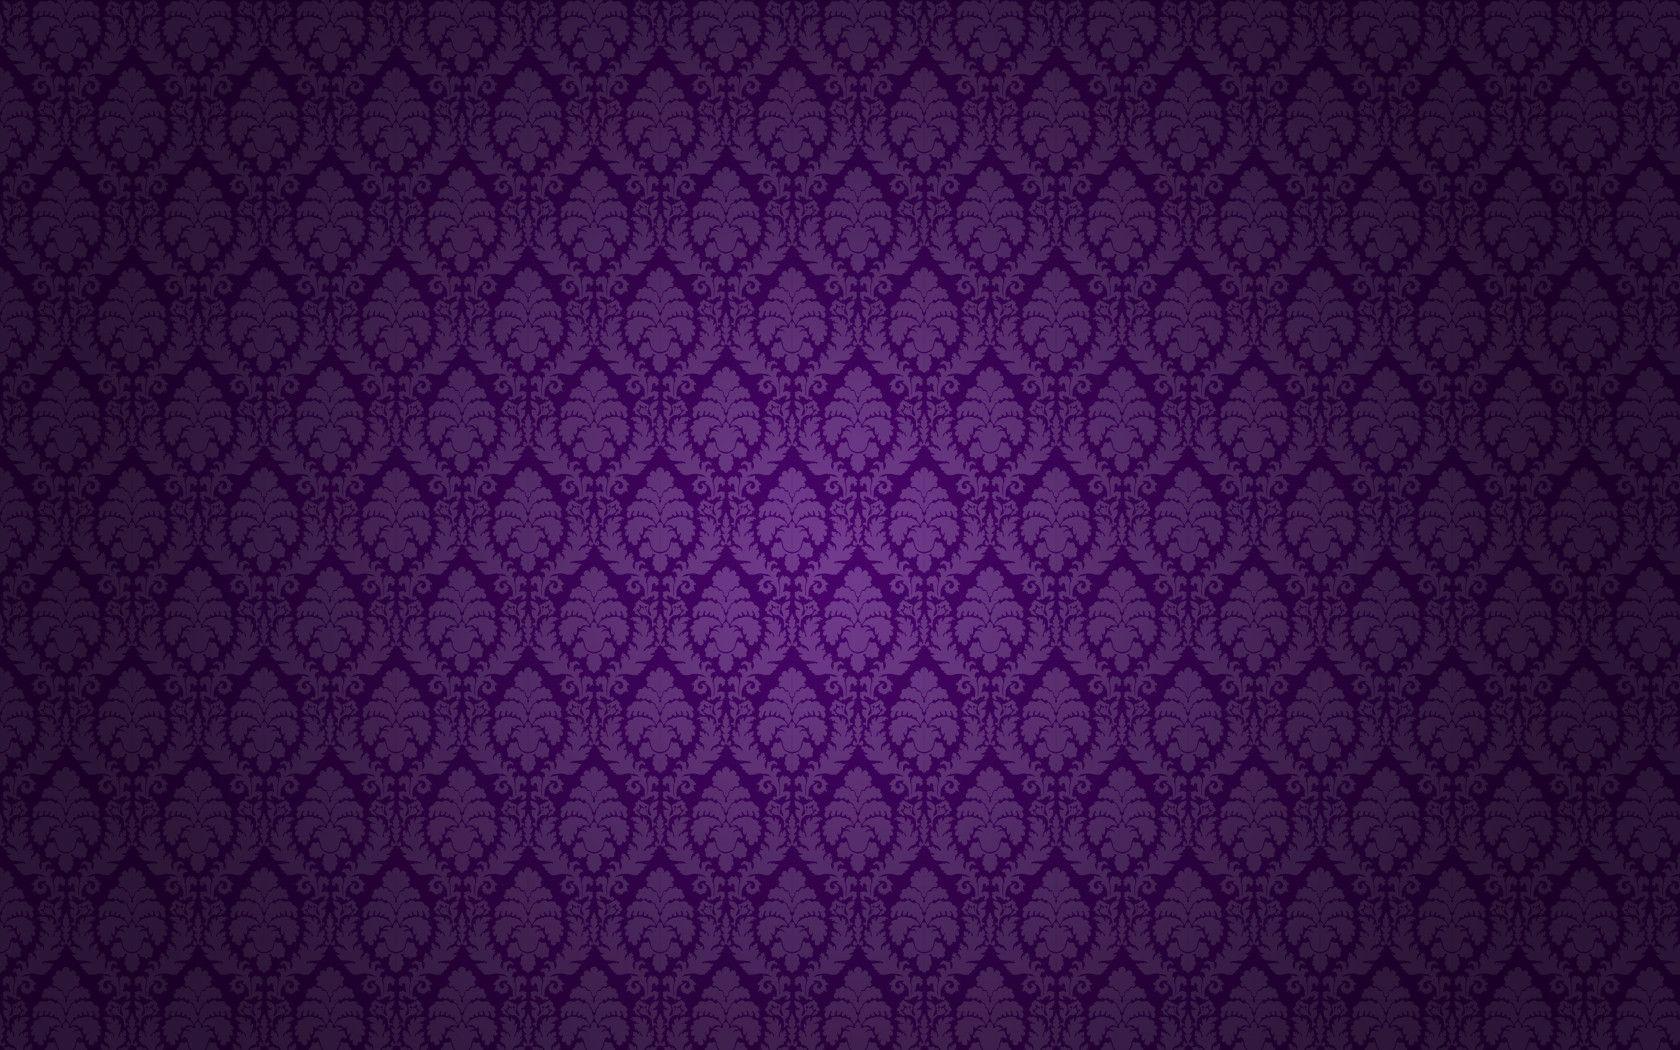 purple damask wallpaper -#main